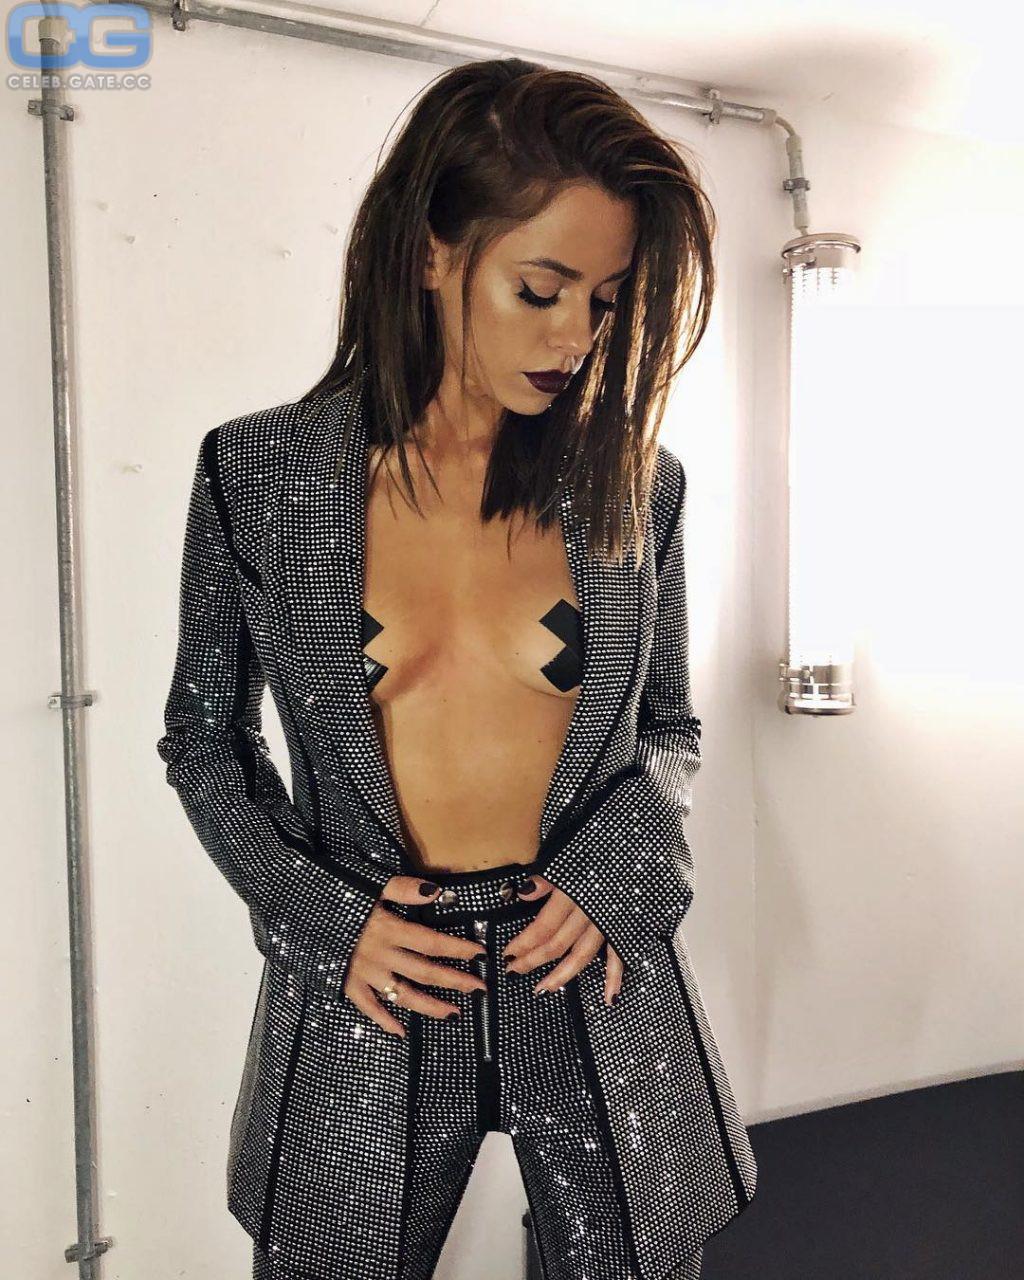 Vanessa mai oben ohne nackt